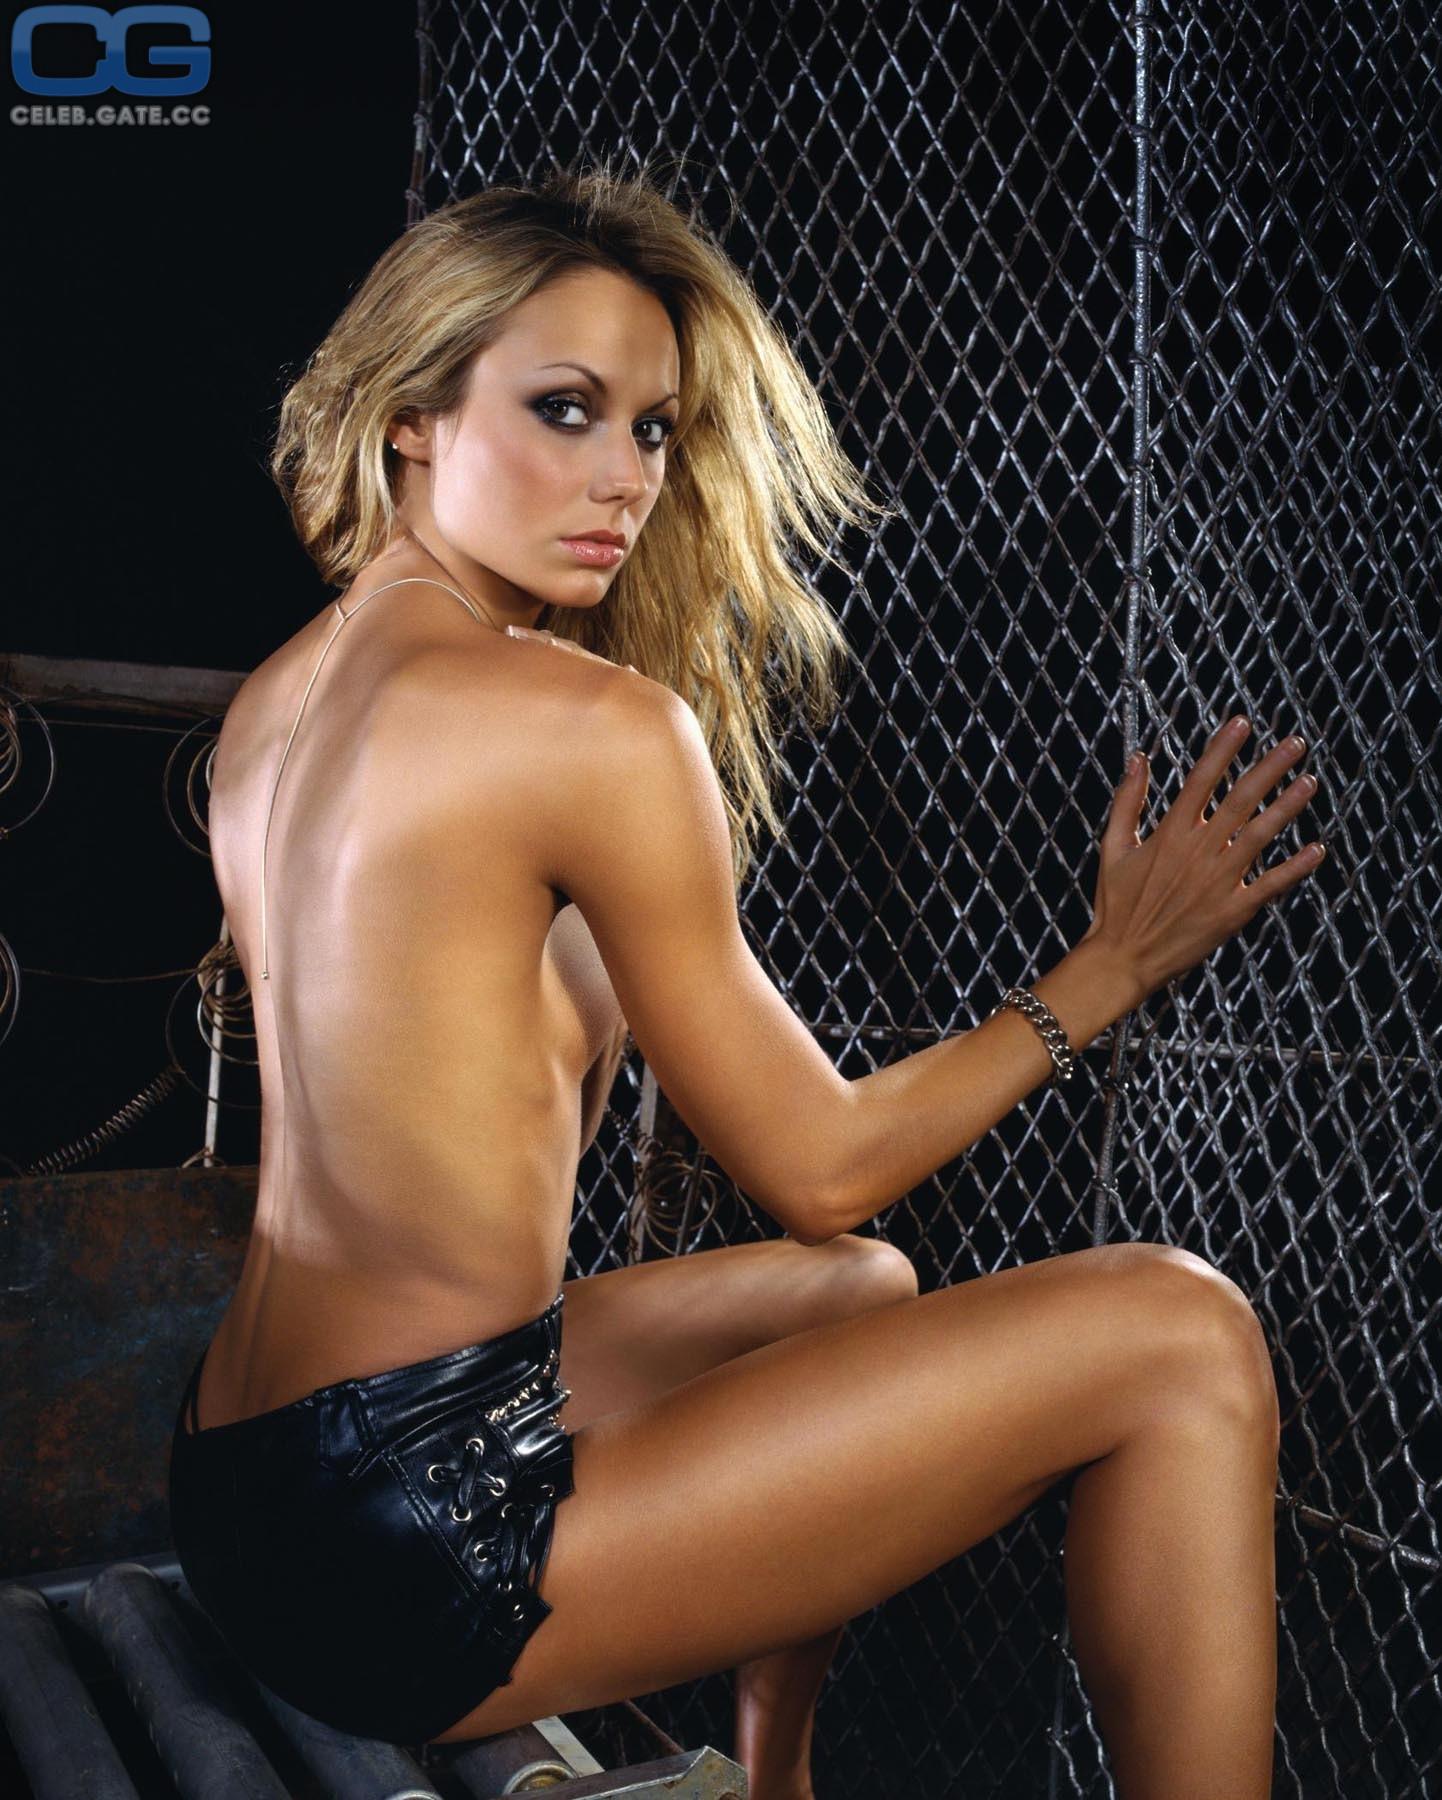 Stacey keibler nude pics